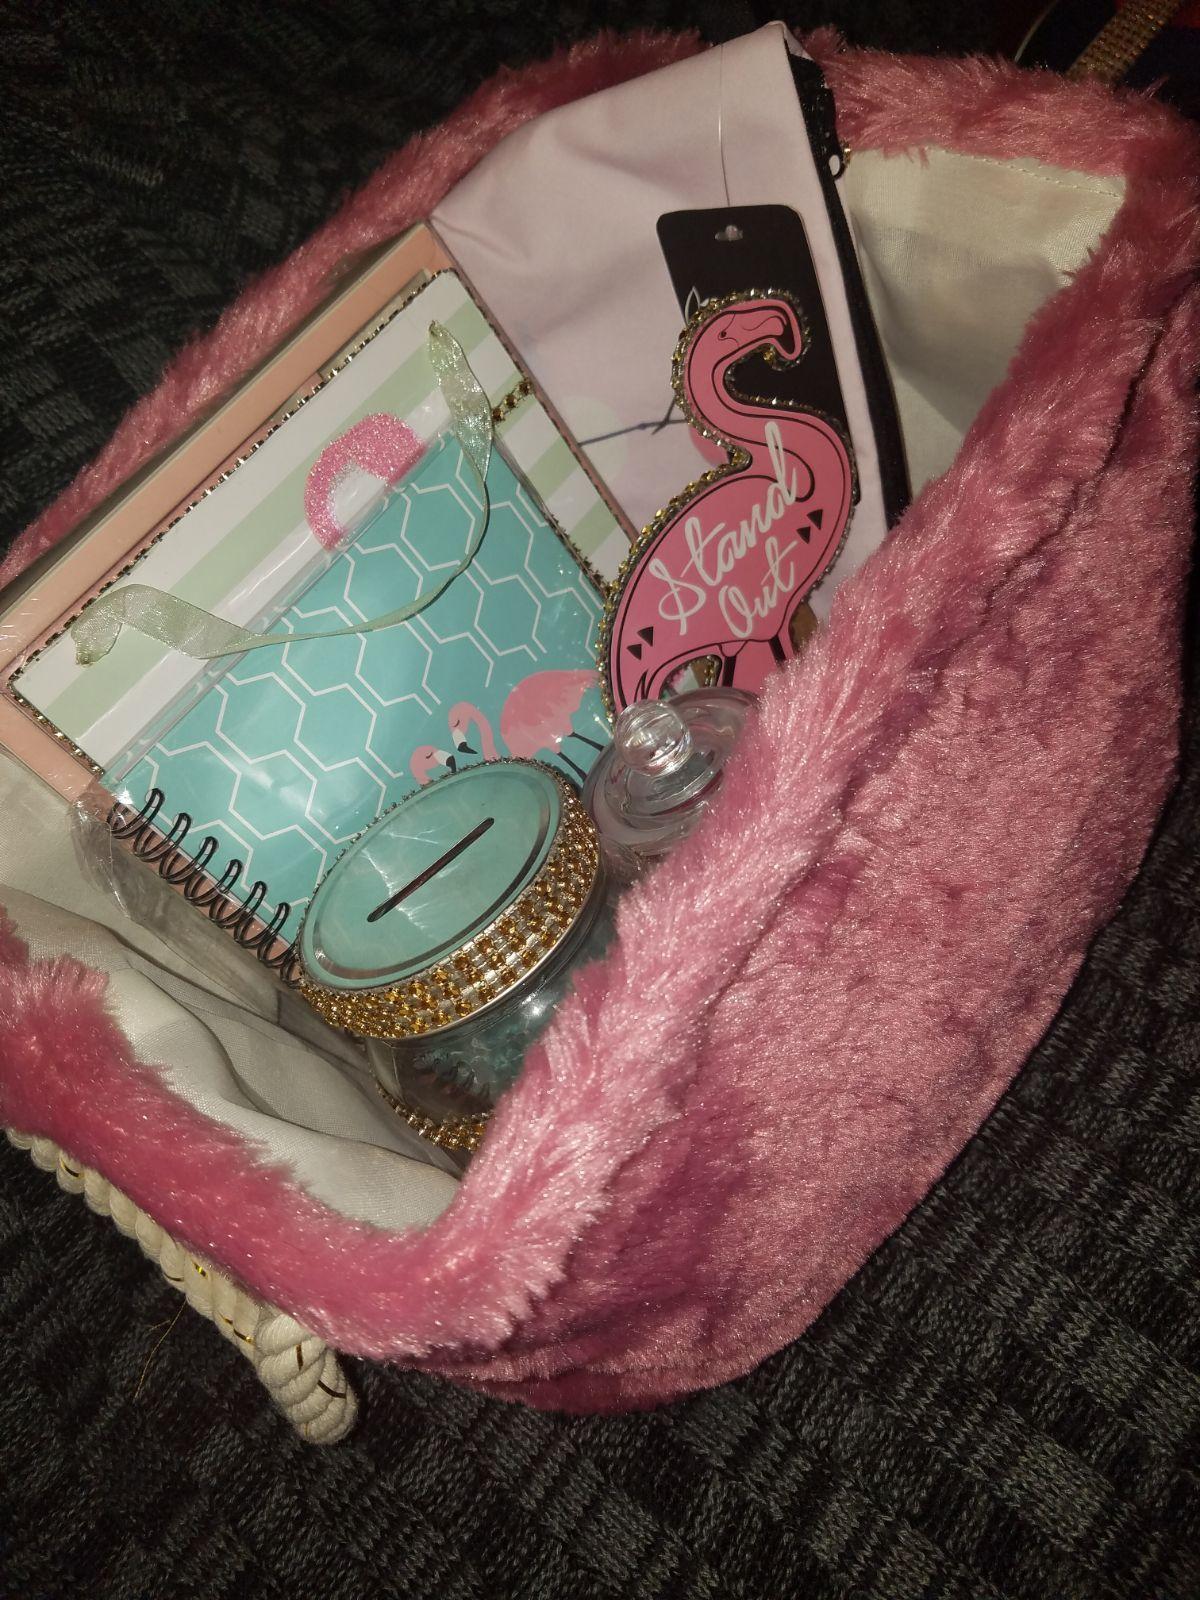 amazon gift box packaging